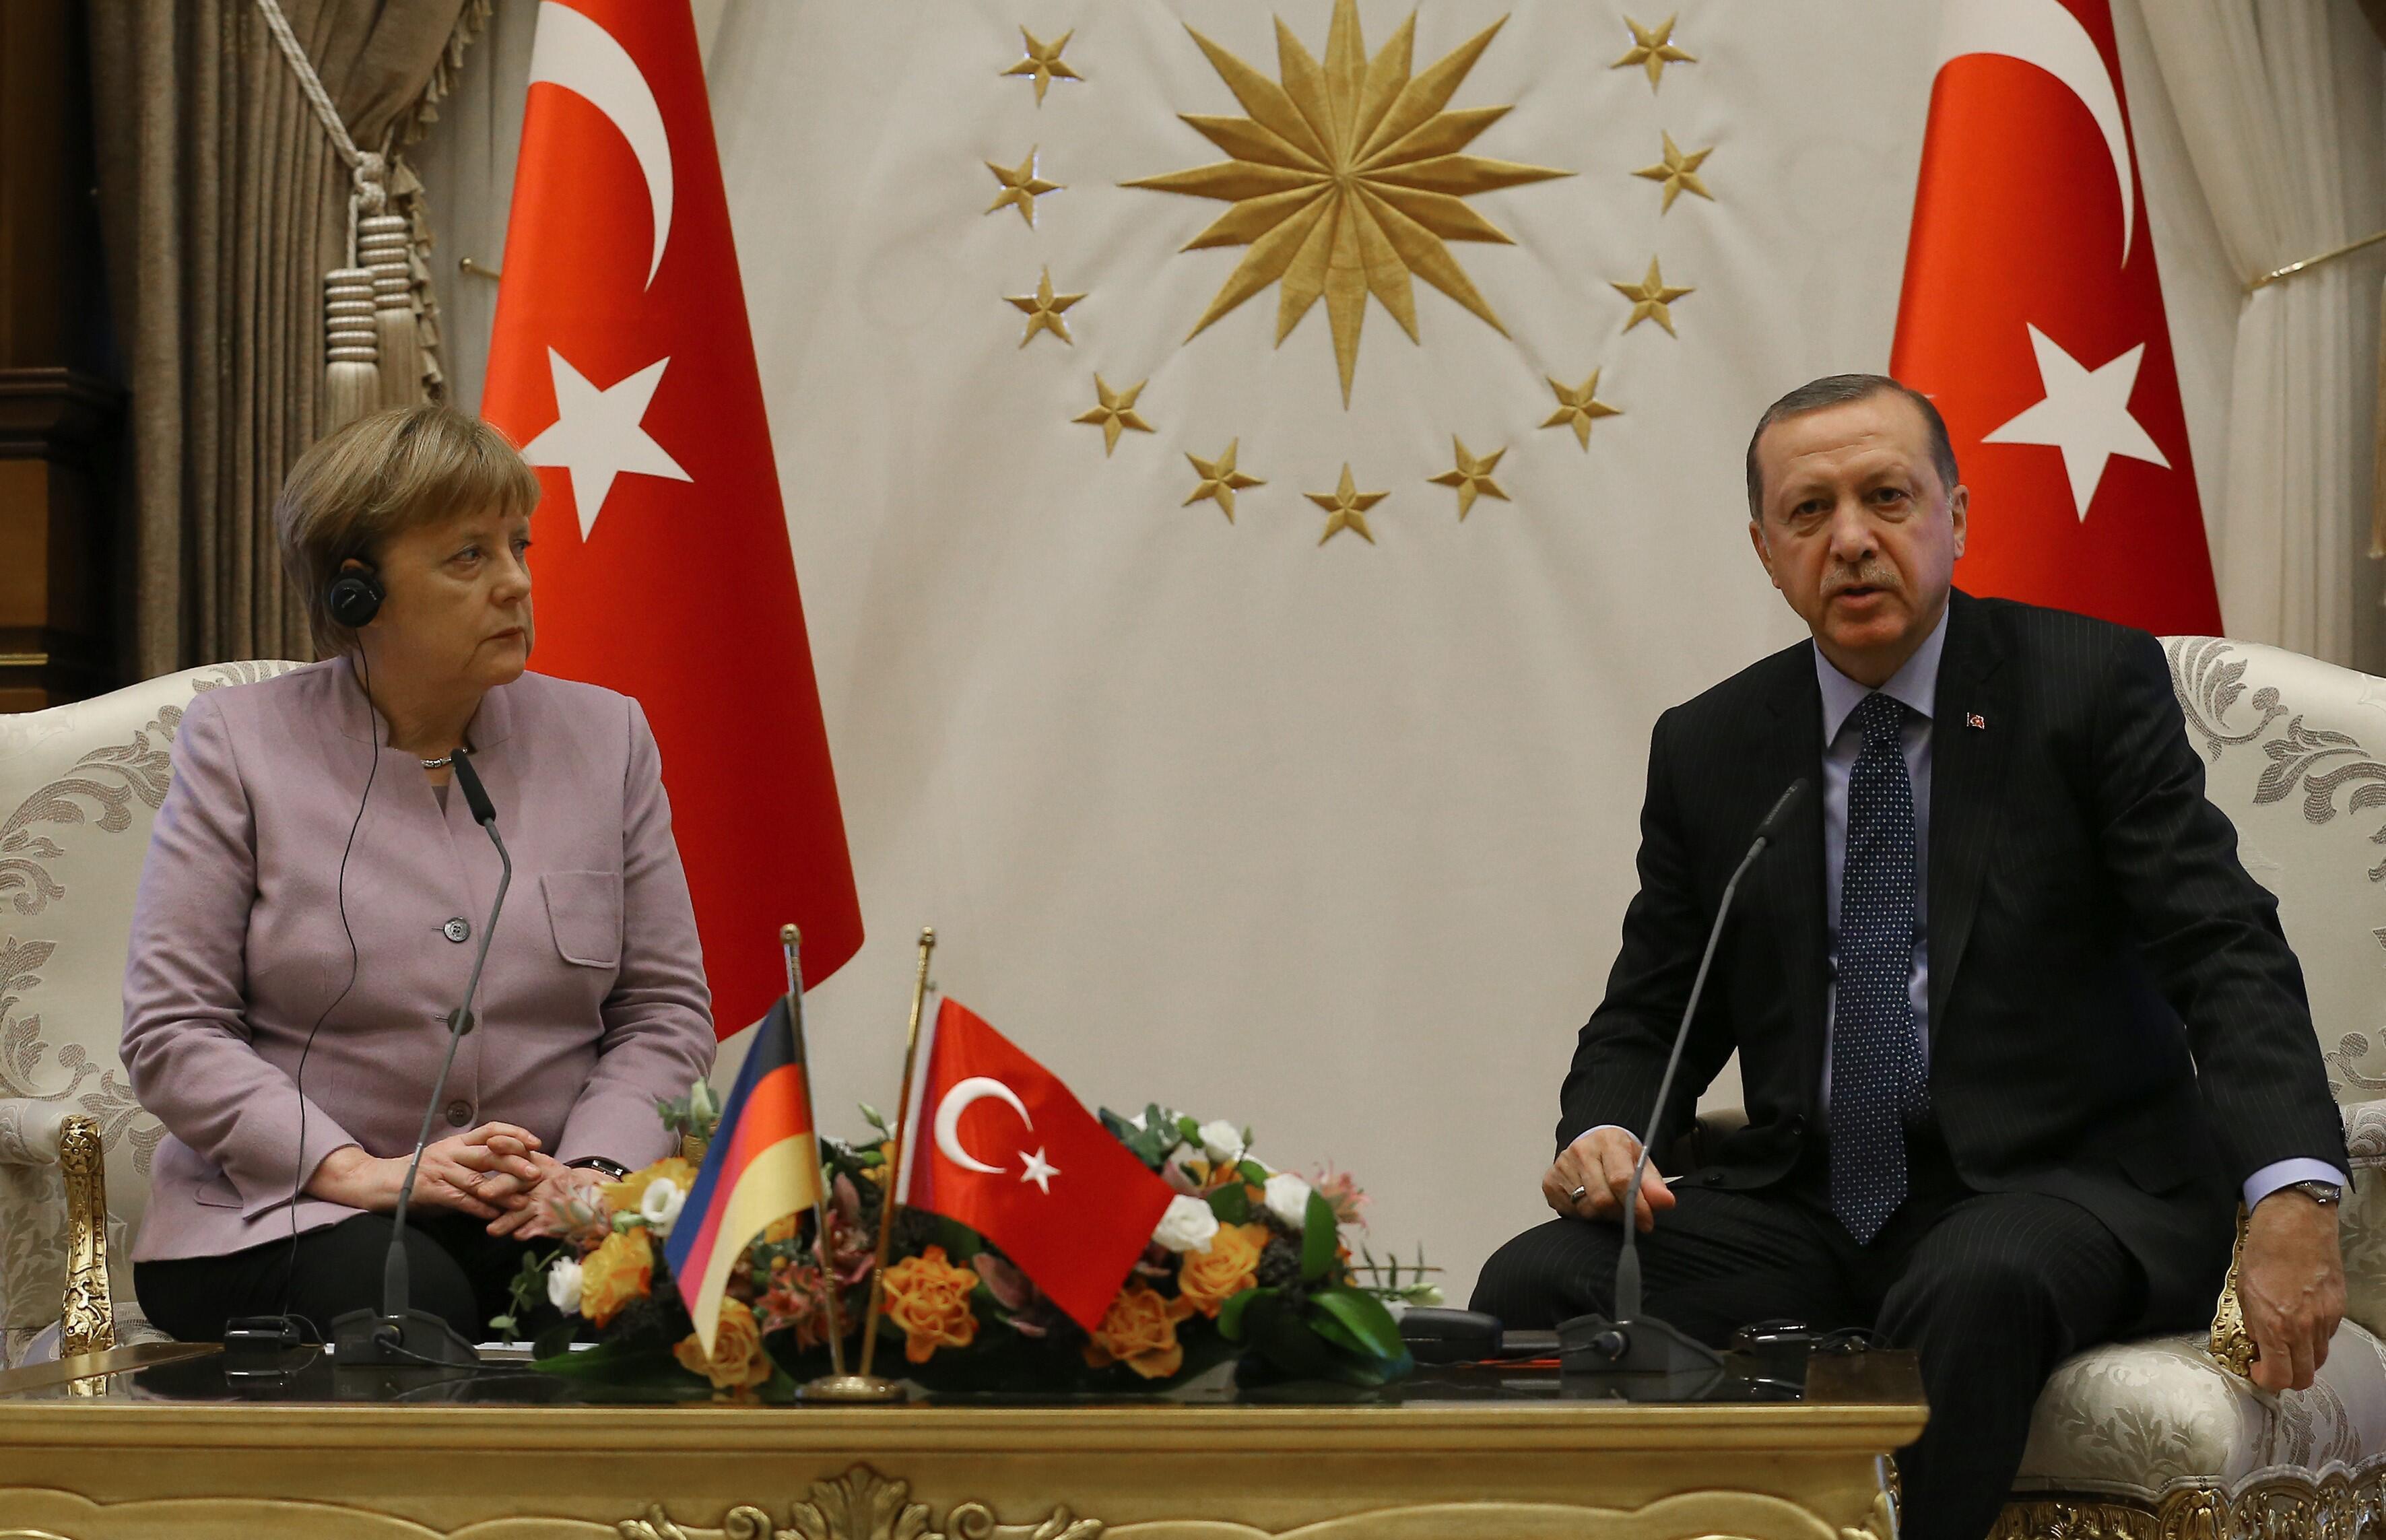 Bild zu Angela Merkel, Recep Tayyip Erdogan